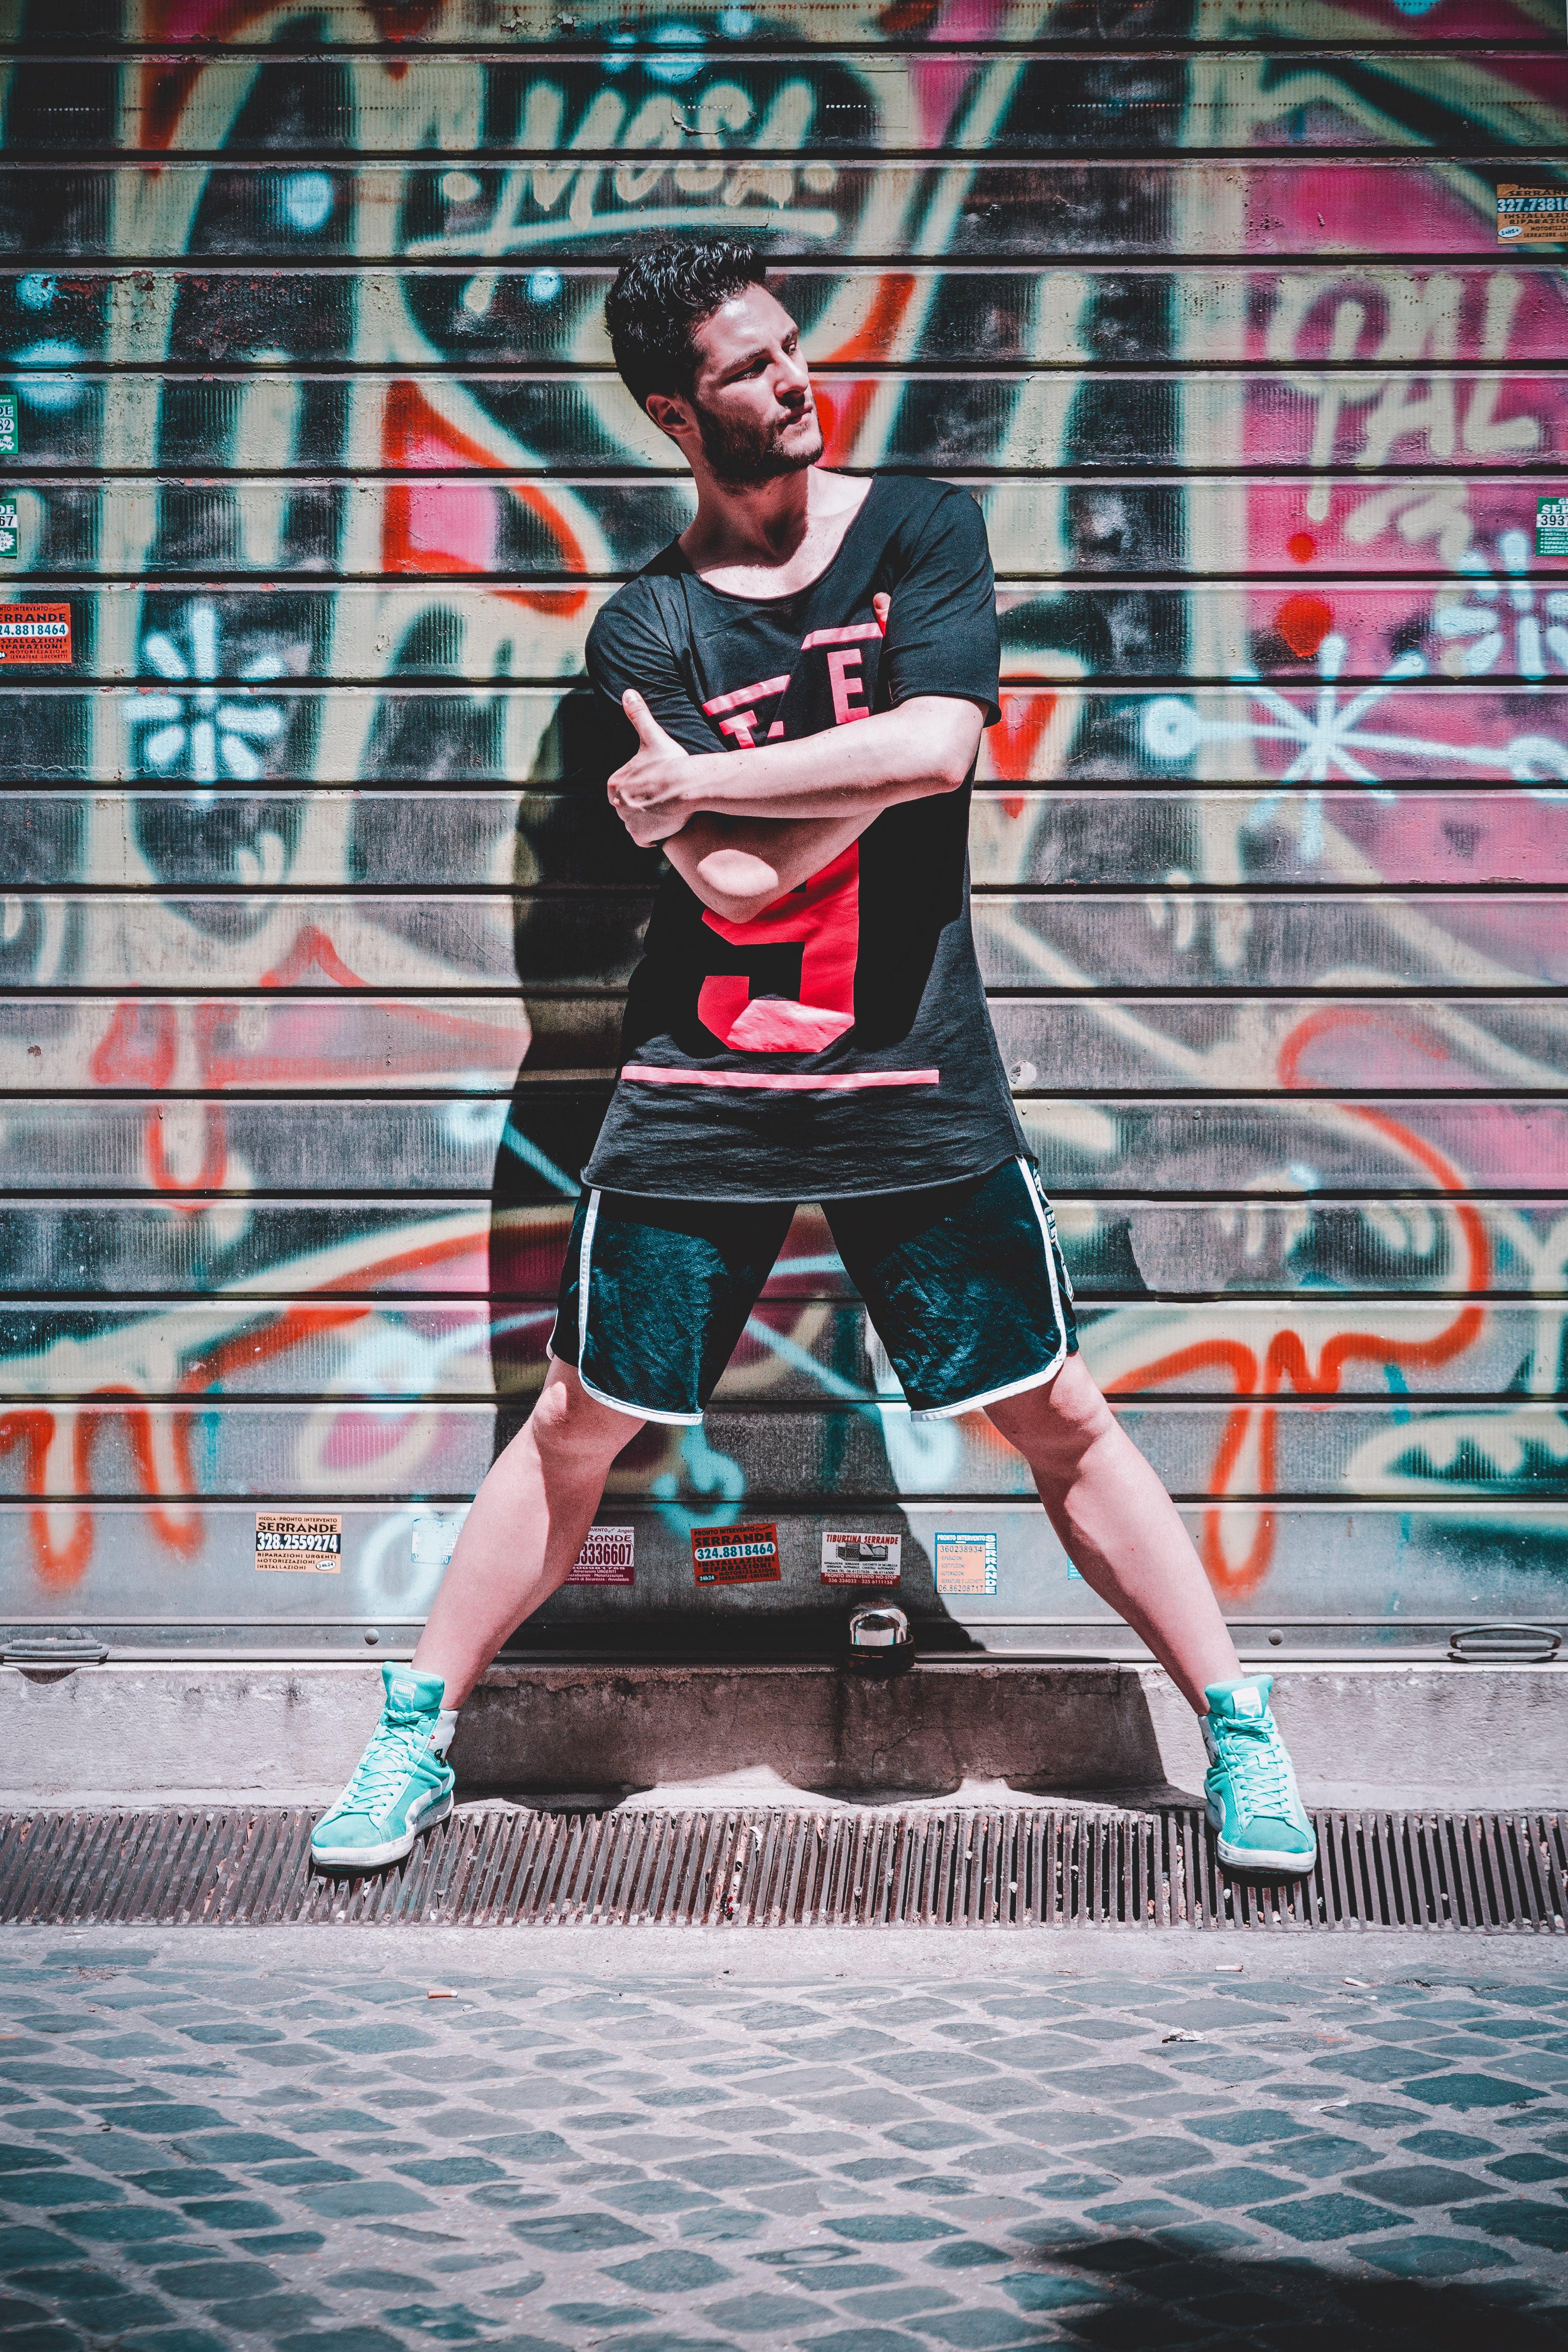 Gratis lagerfoto af flot, gade, gadekunst, graffiti